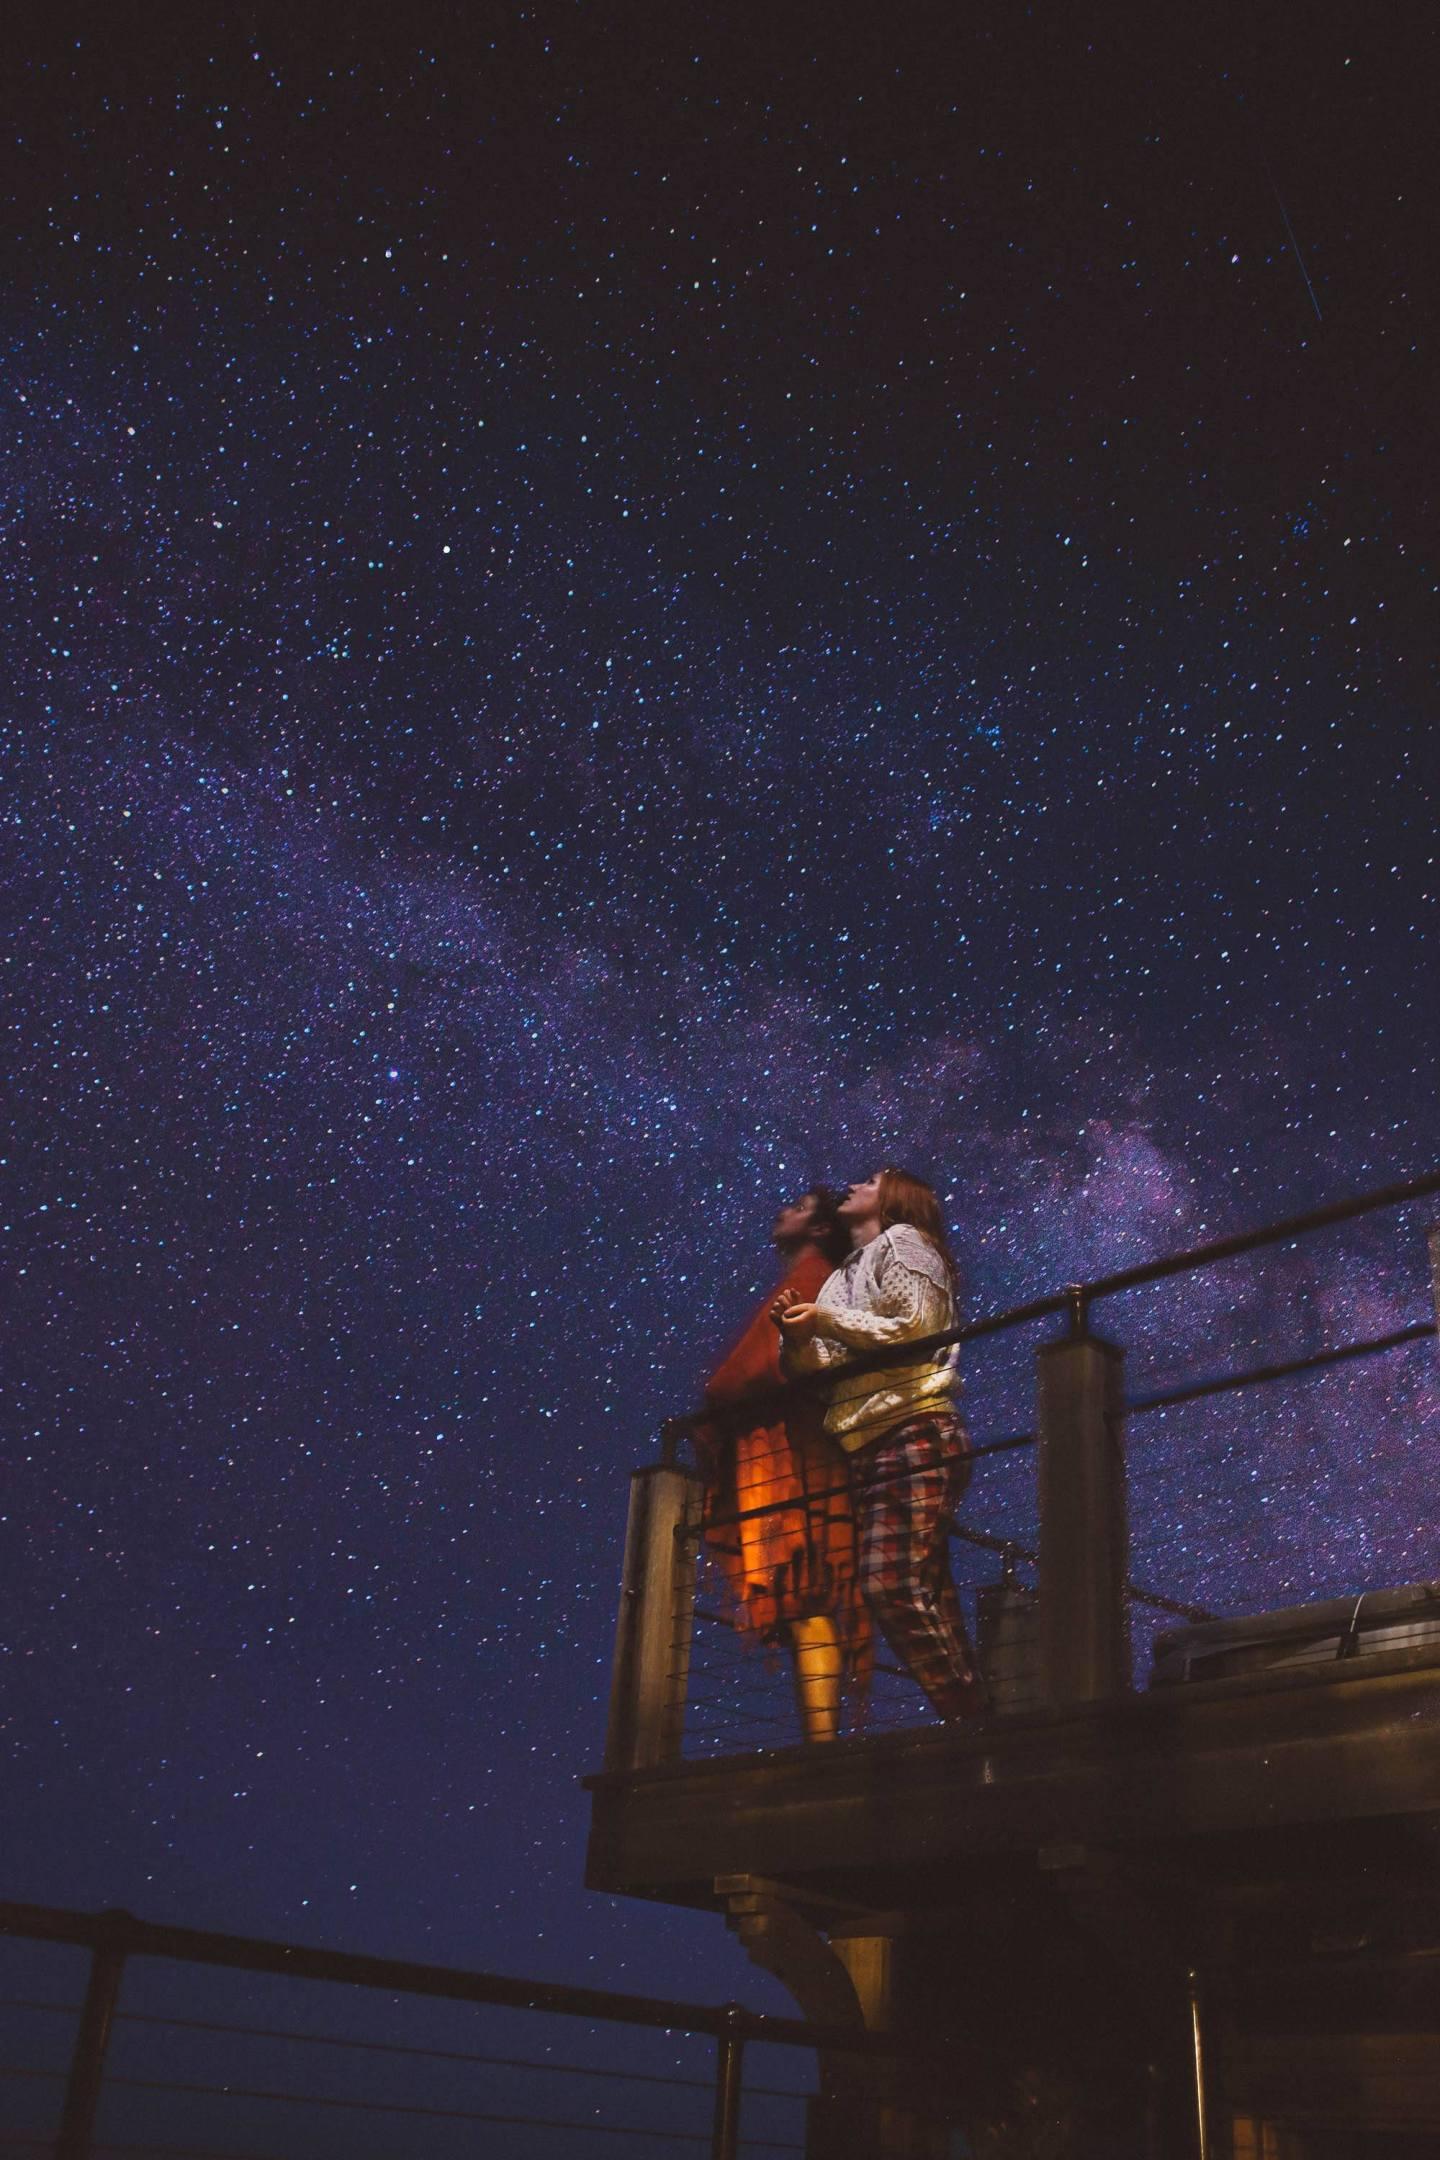 starry night long exposure